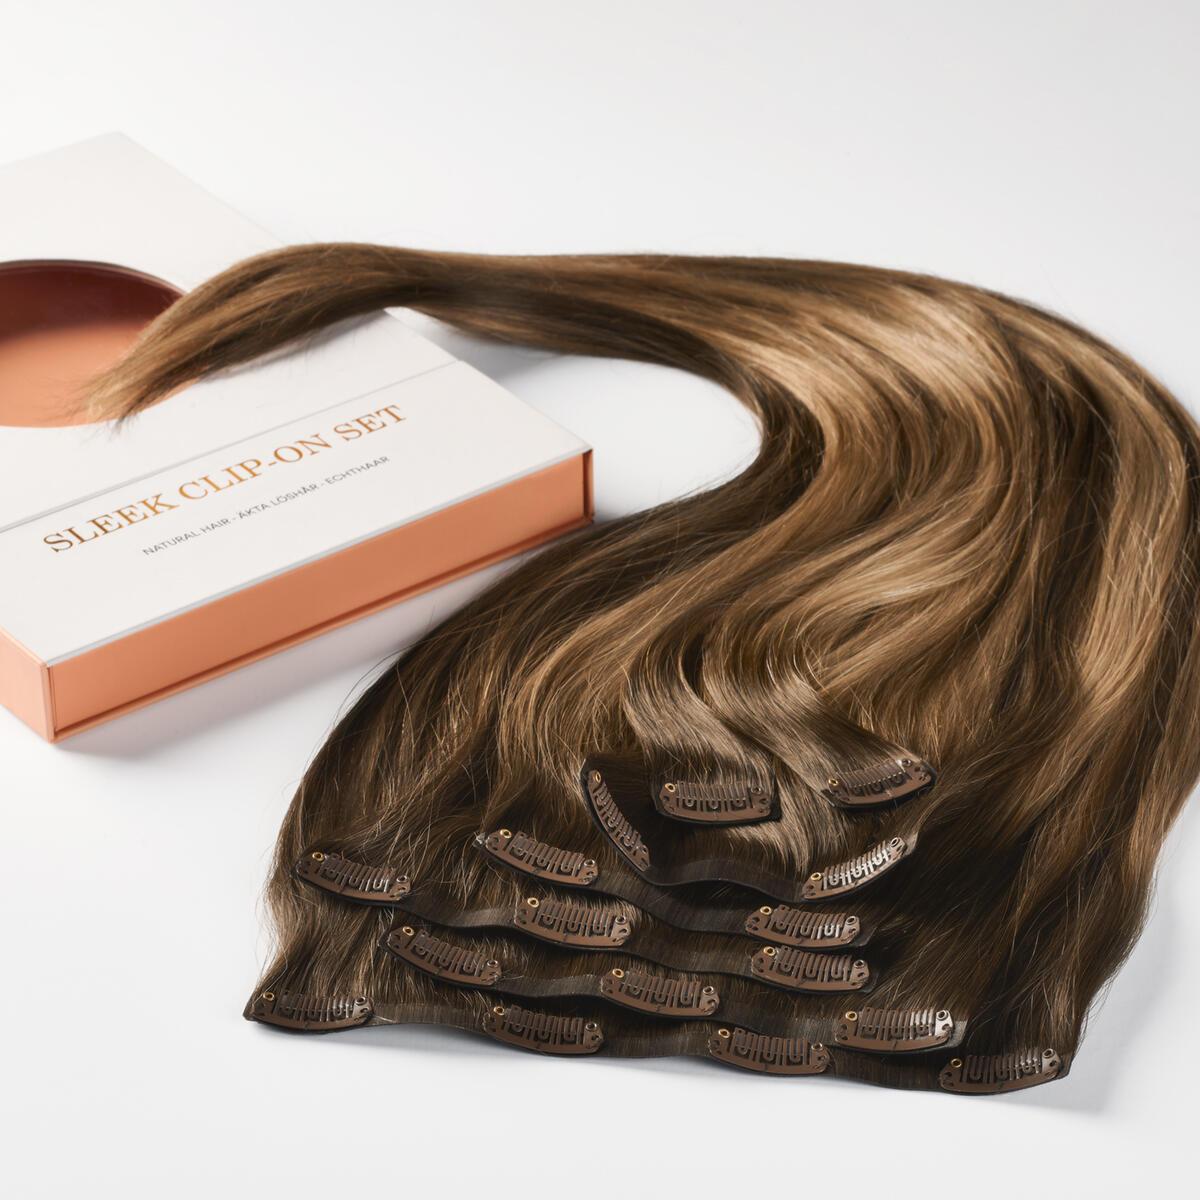 Sleek Clip-on set 7 pieces B2.3/5.0 Hazelnut Caramel Balayage 50 cm